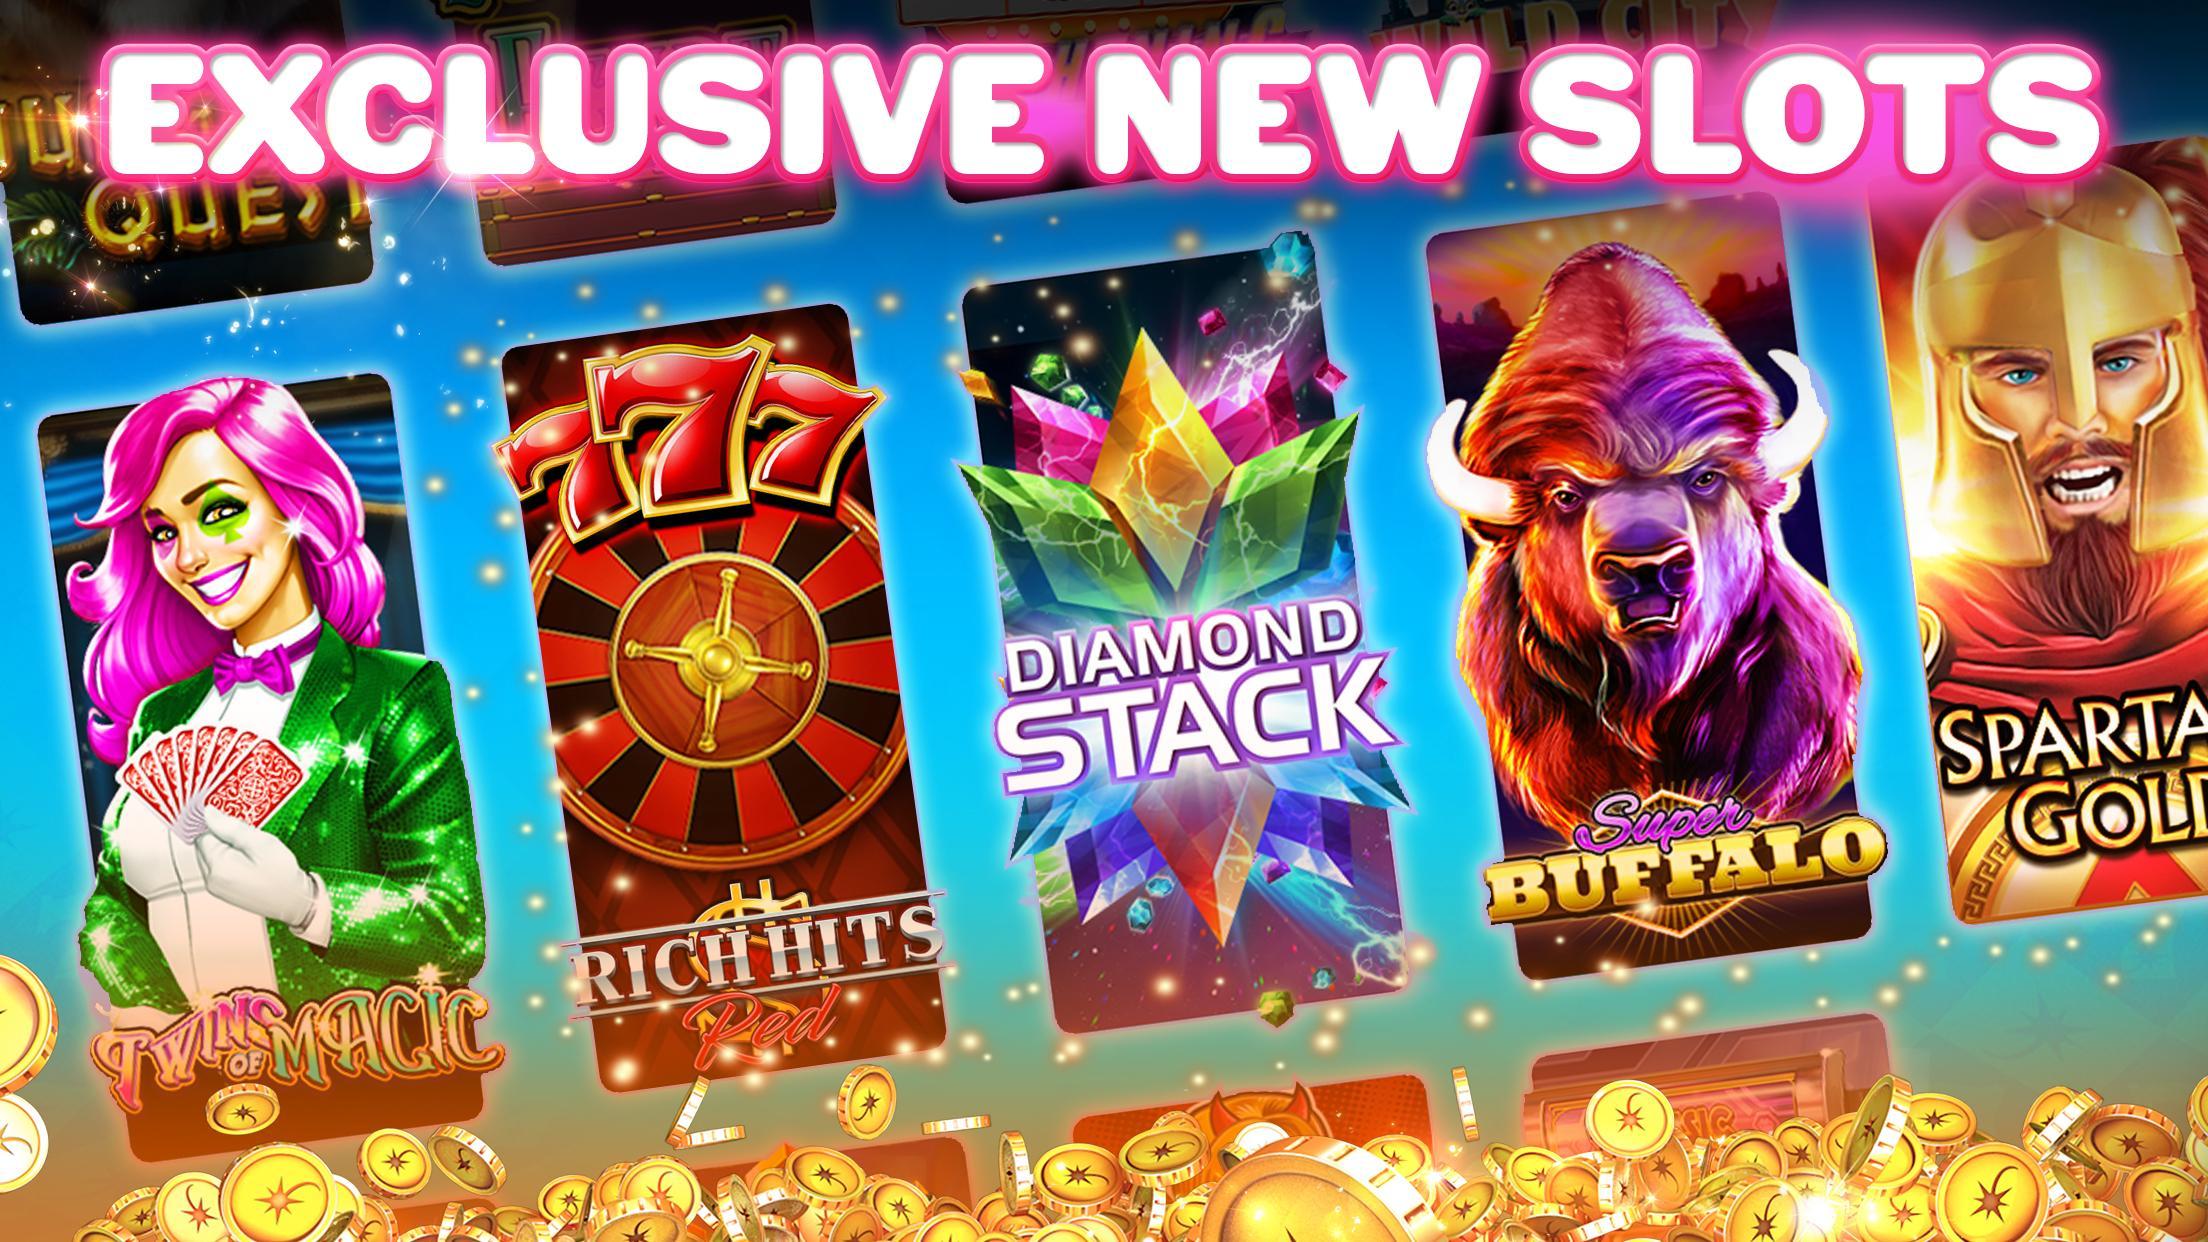 Jackpotjoy Slots Slot machines with Bonus Games 26.0.05 Screenshot 14